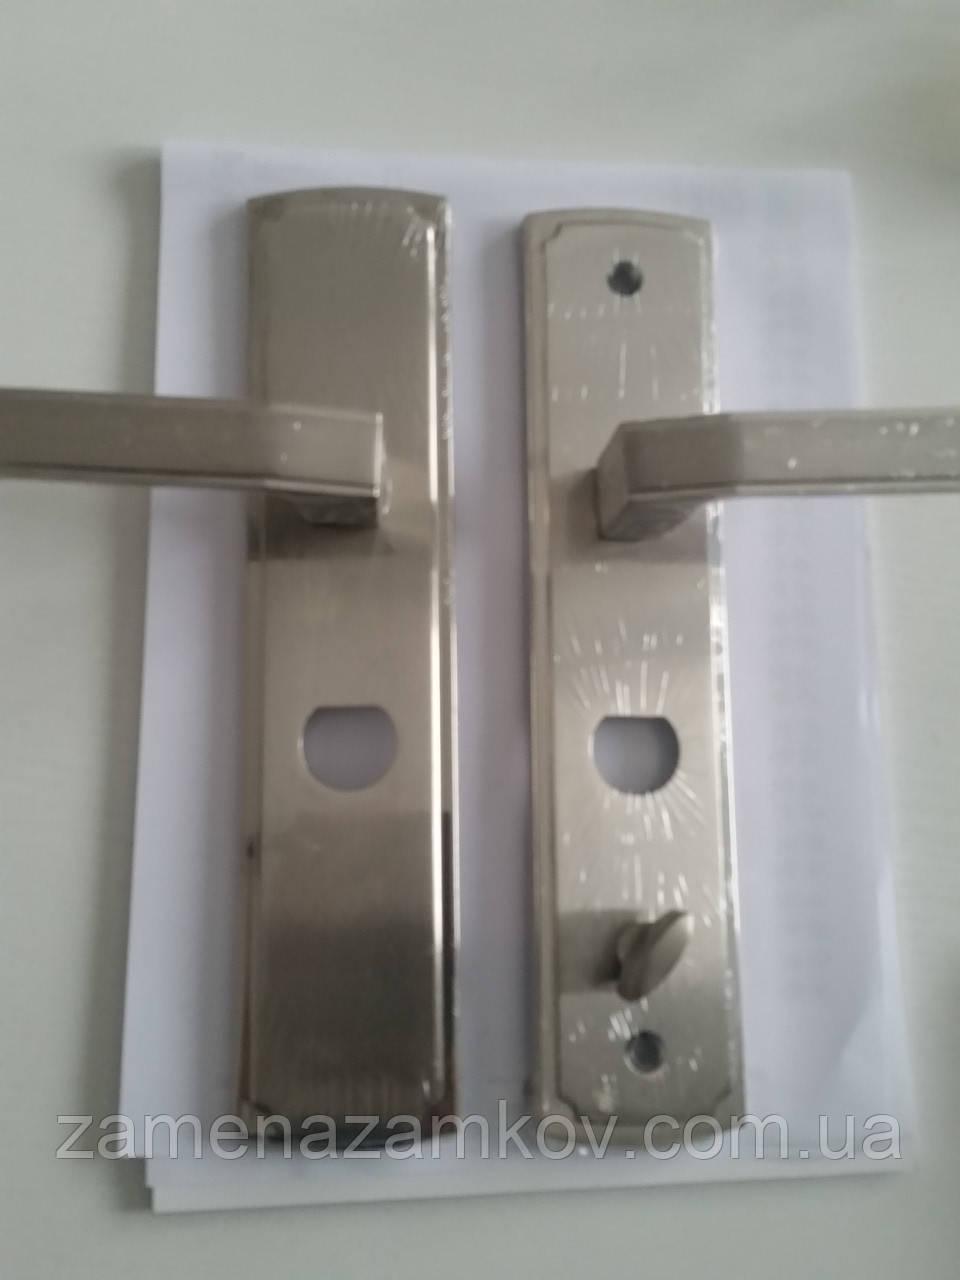 Mexin AFS ручки дверные Правые AFN ANFLock